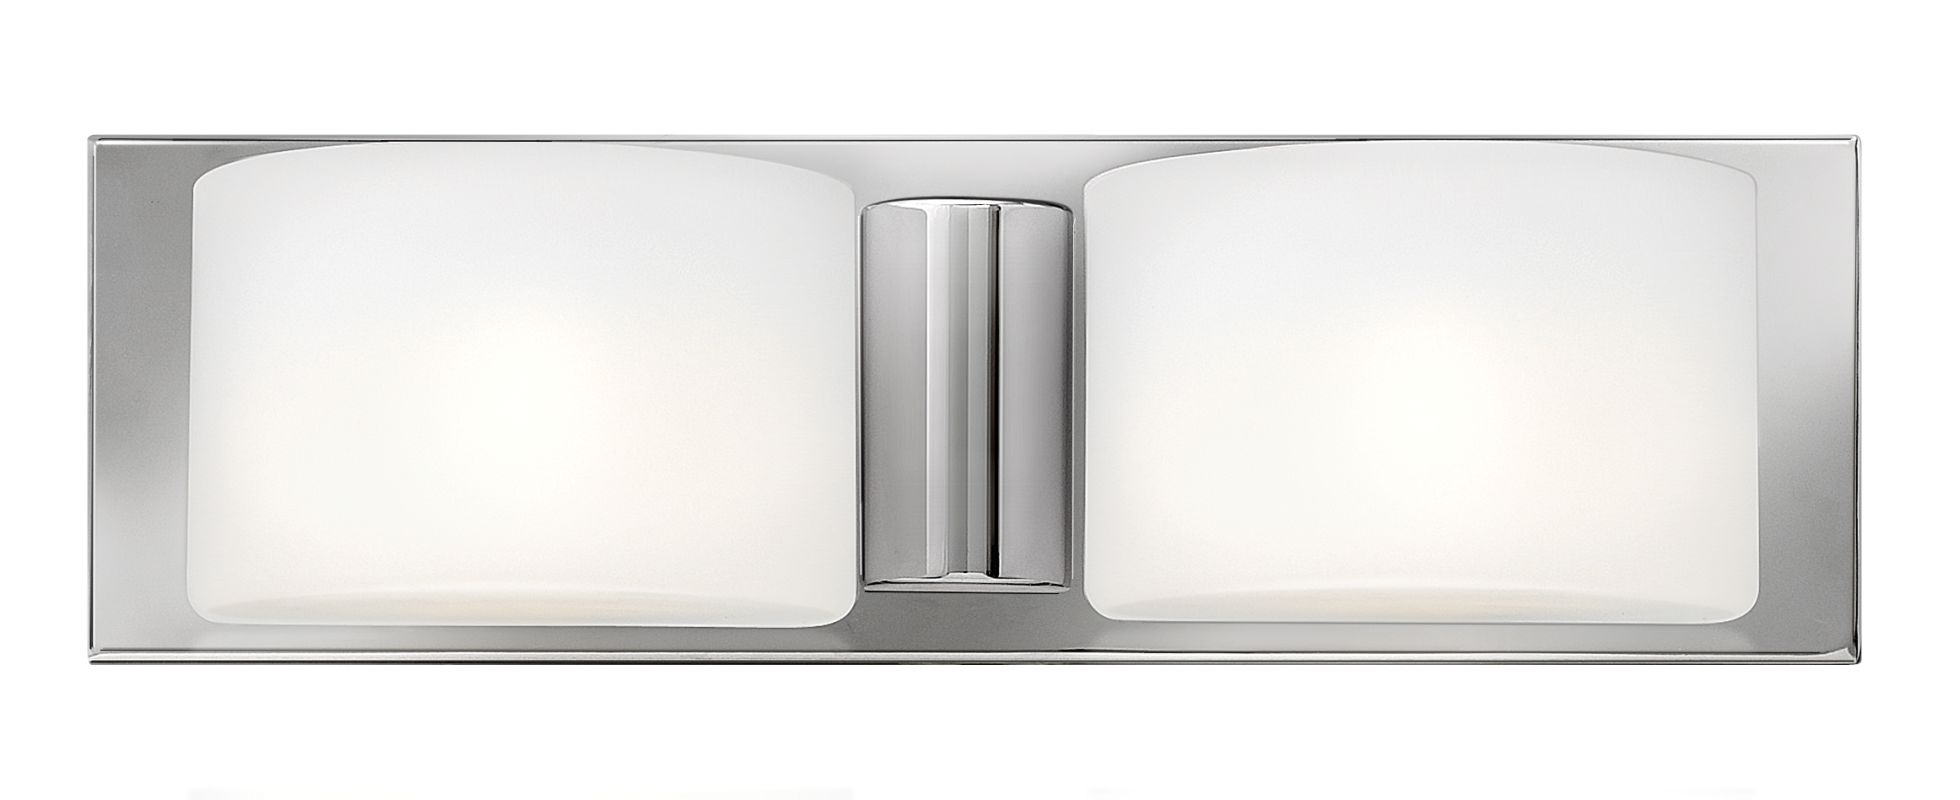 Hinkley Lighting 55482 2 Light Bathroom Vanity Light from the Daria